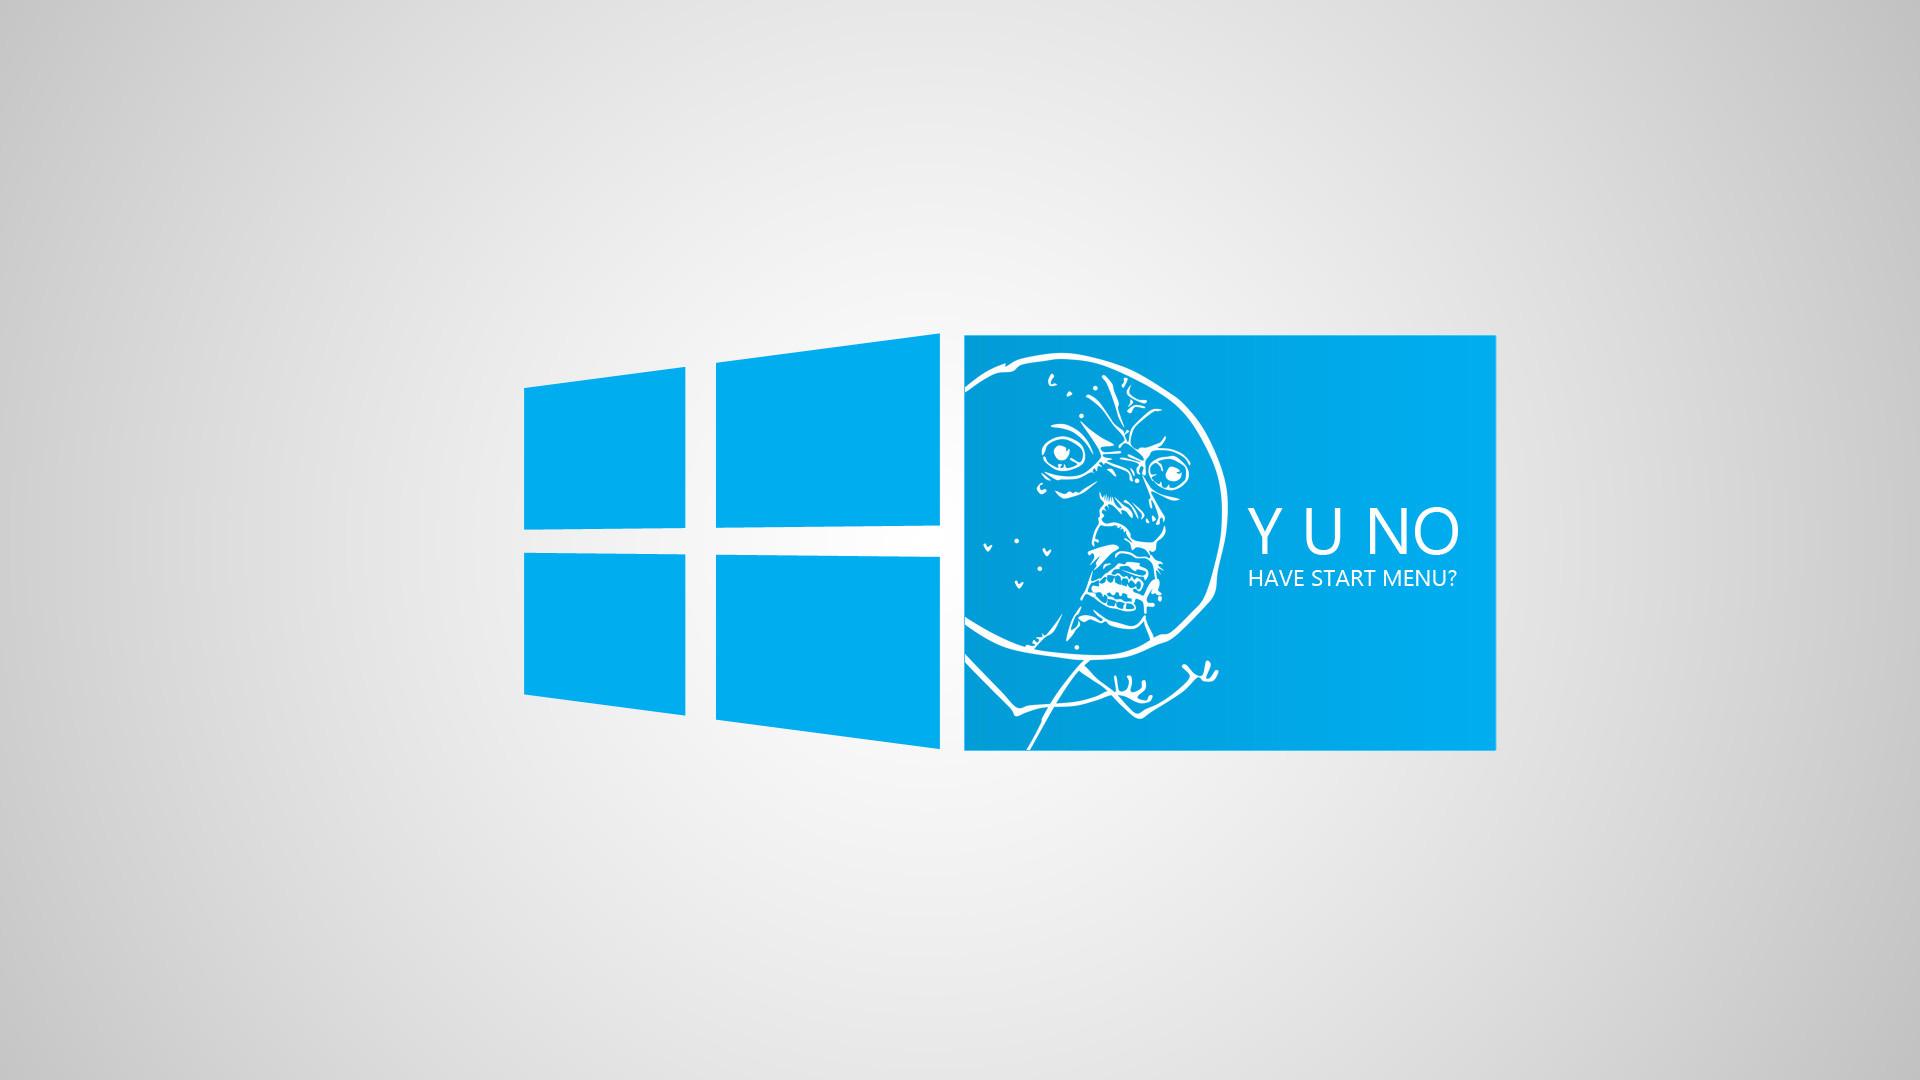 Funny Blue Windows 8 Meme Desktop Wallpaper